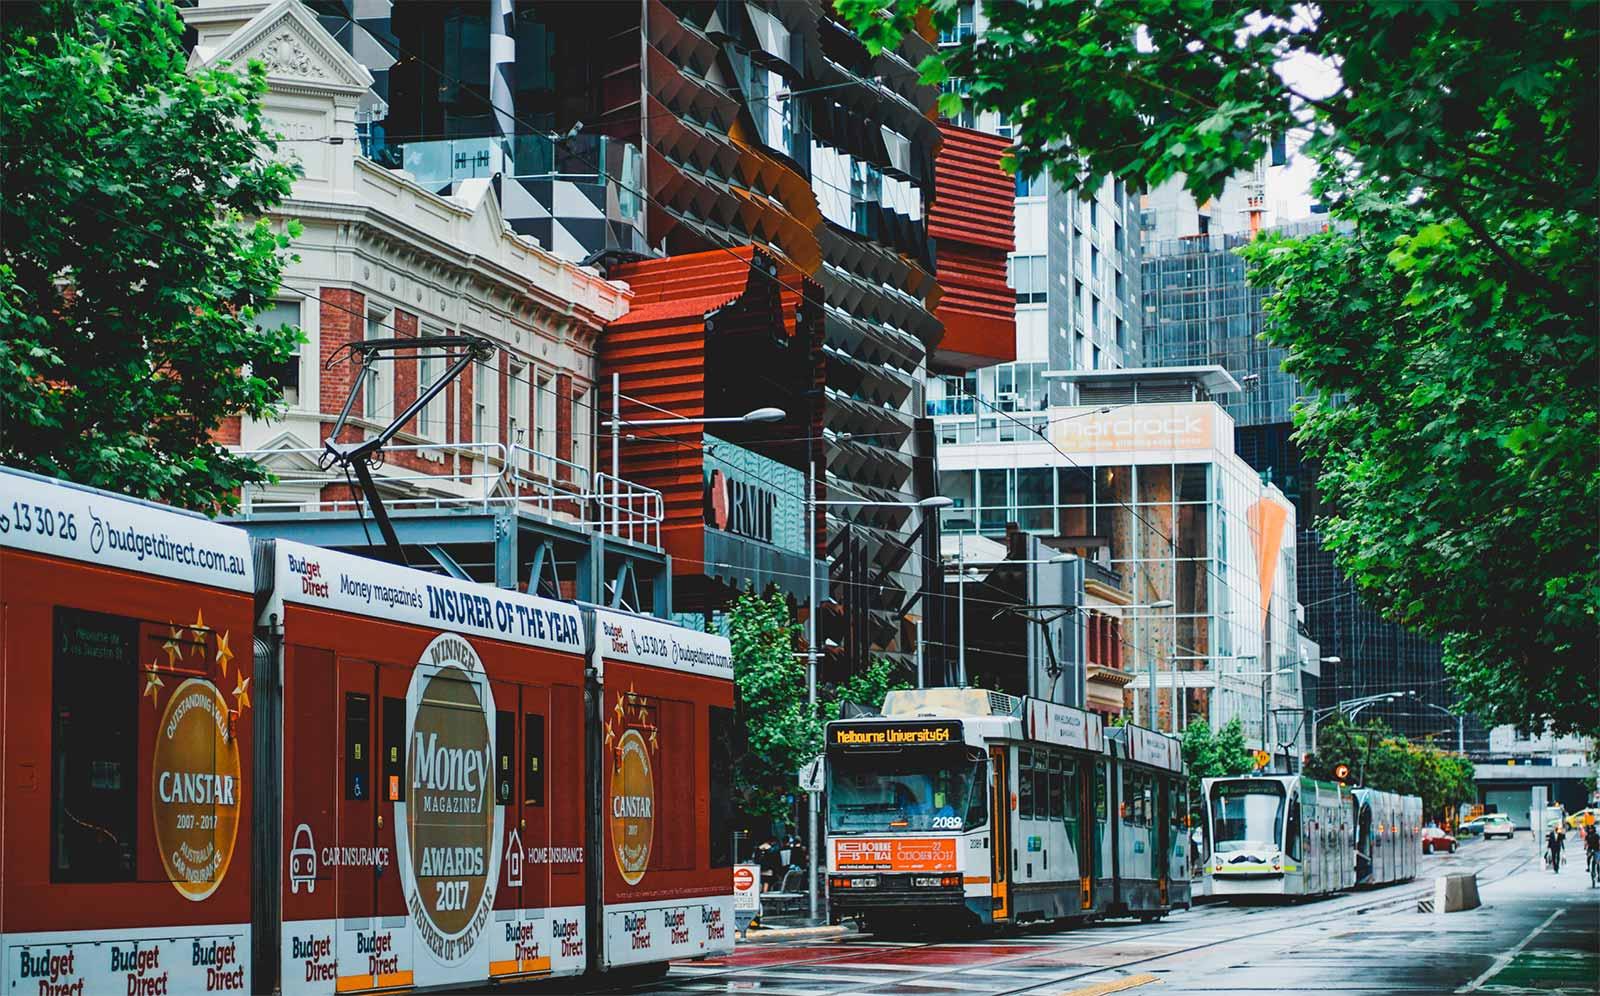 Reimagining city planning